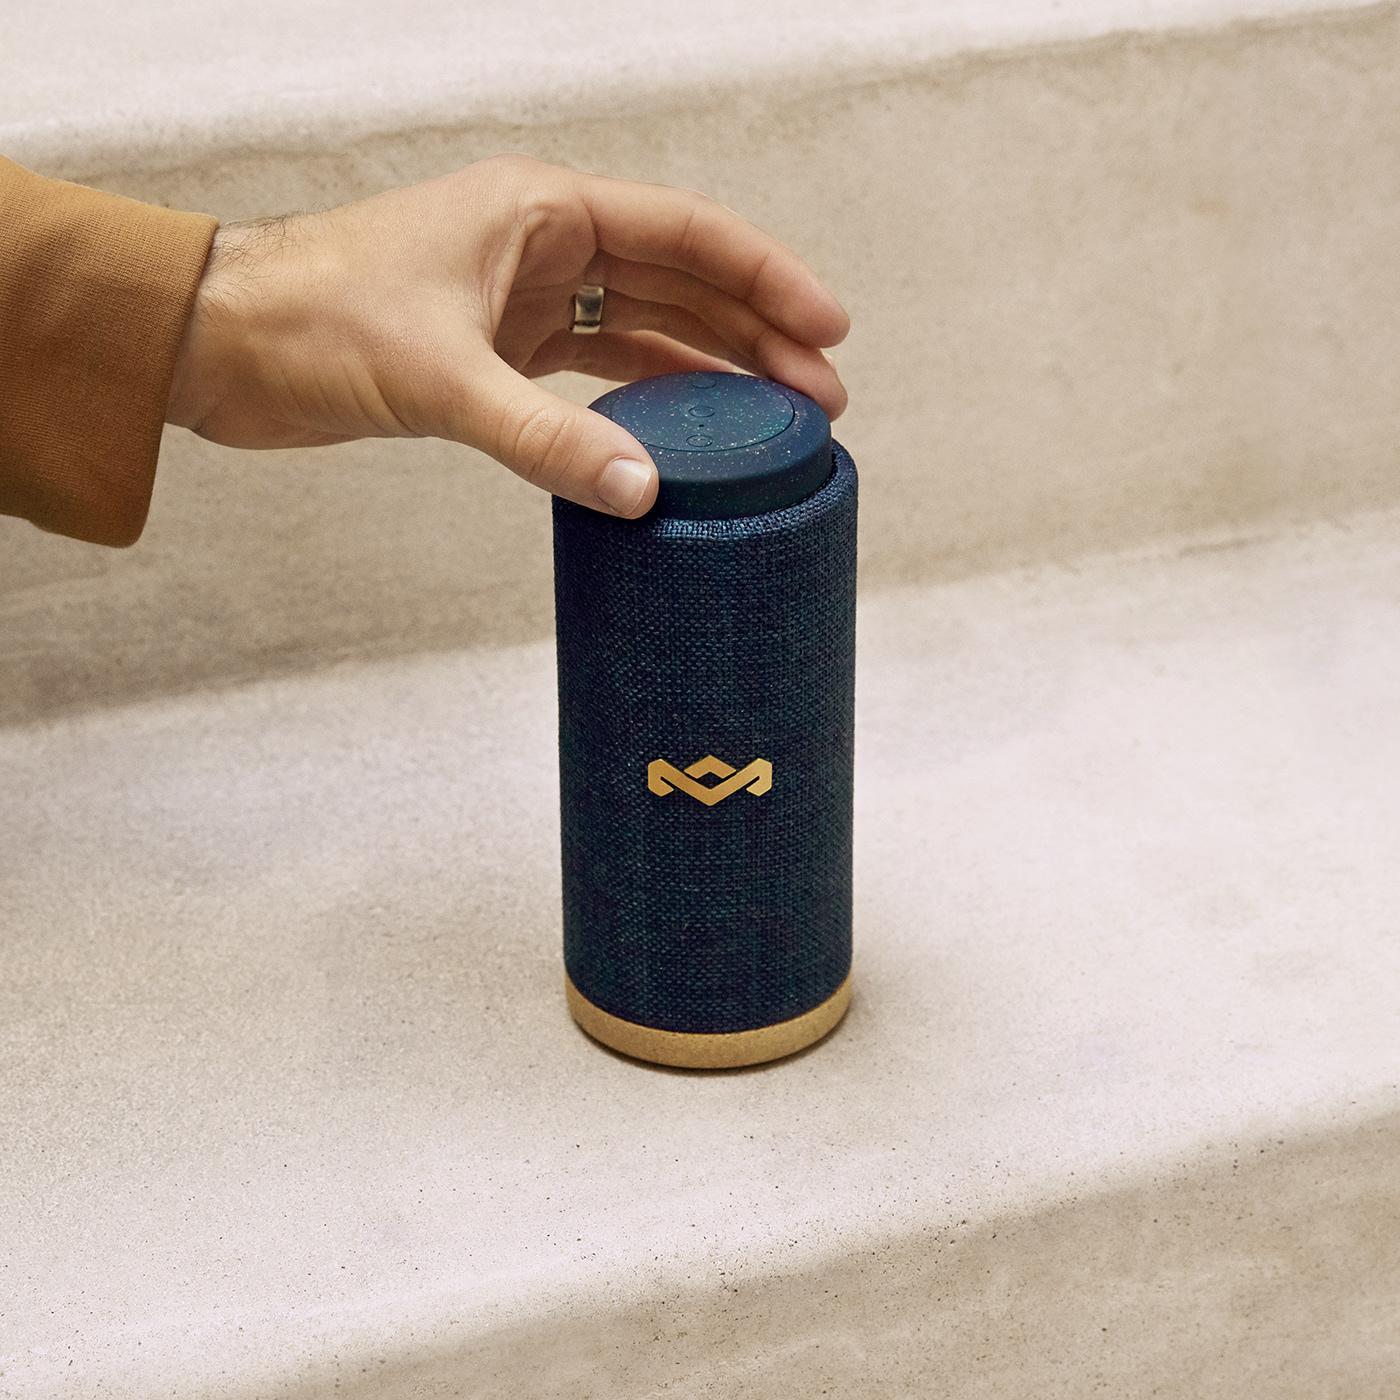 speaker industrial design  product design  Sustainable nobounds Engineering  minimal